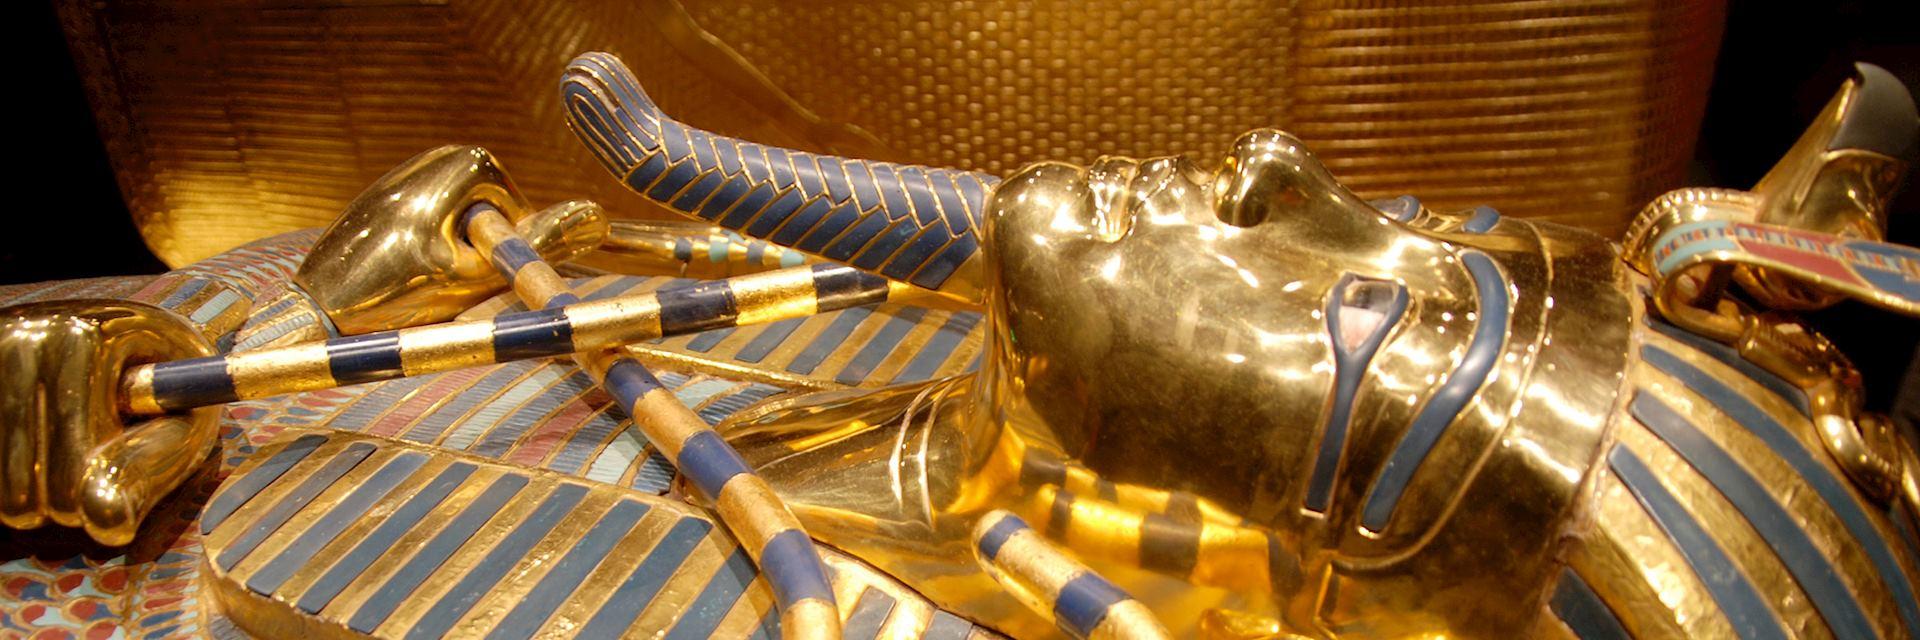 King Tutankhamun's innermost coffin